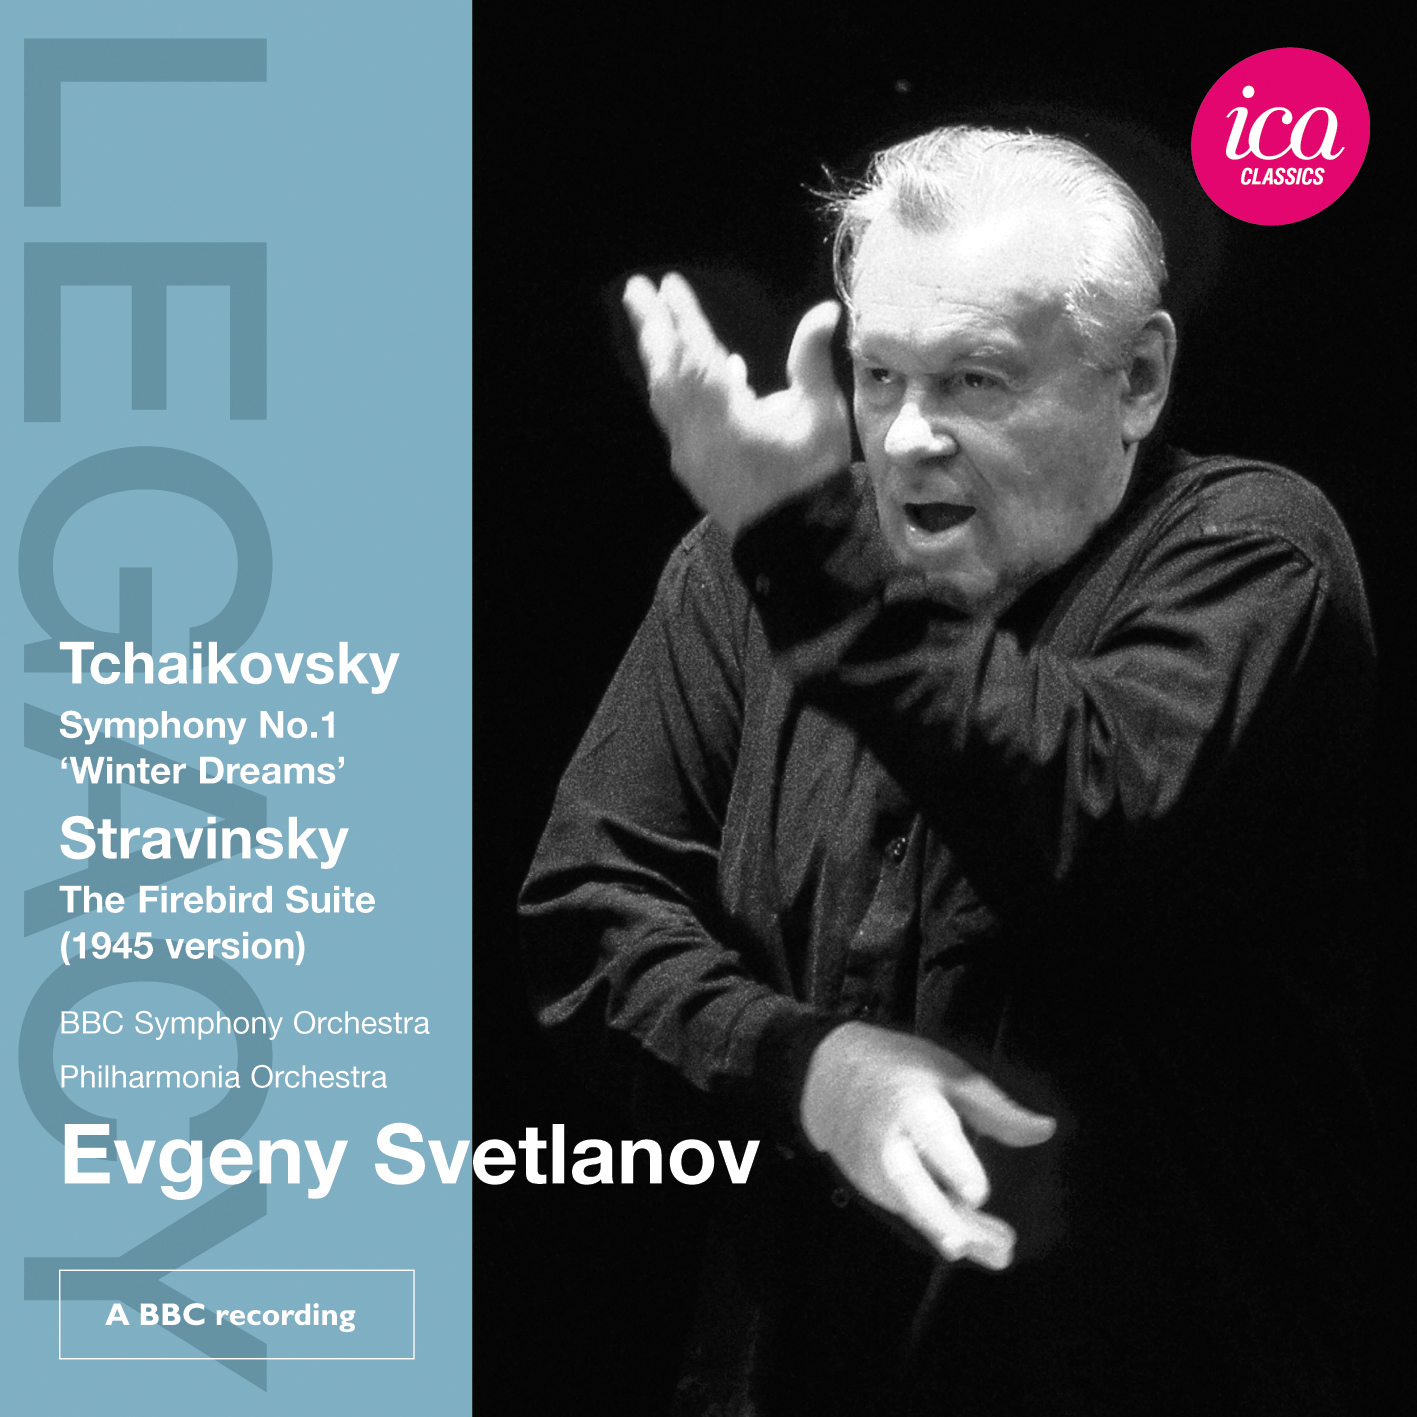 Stravinsky Firebird L'Oiseau de feu et sa danse